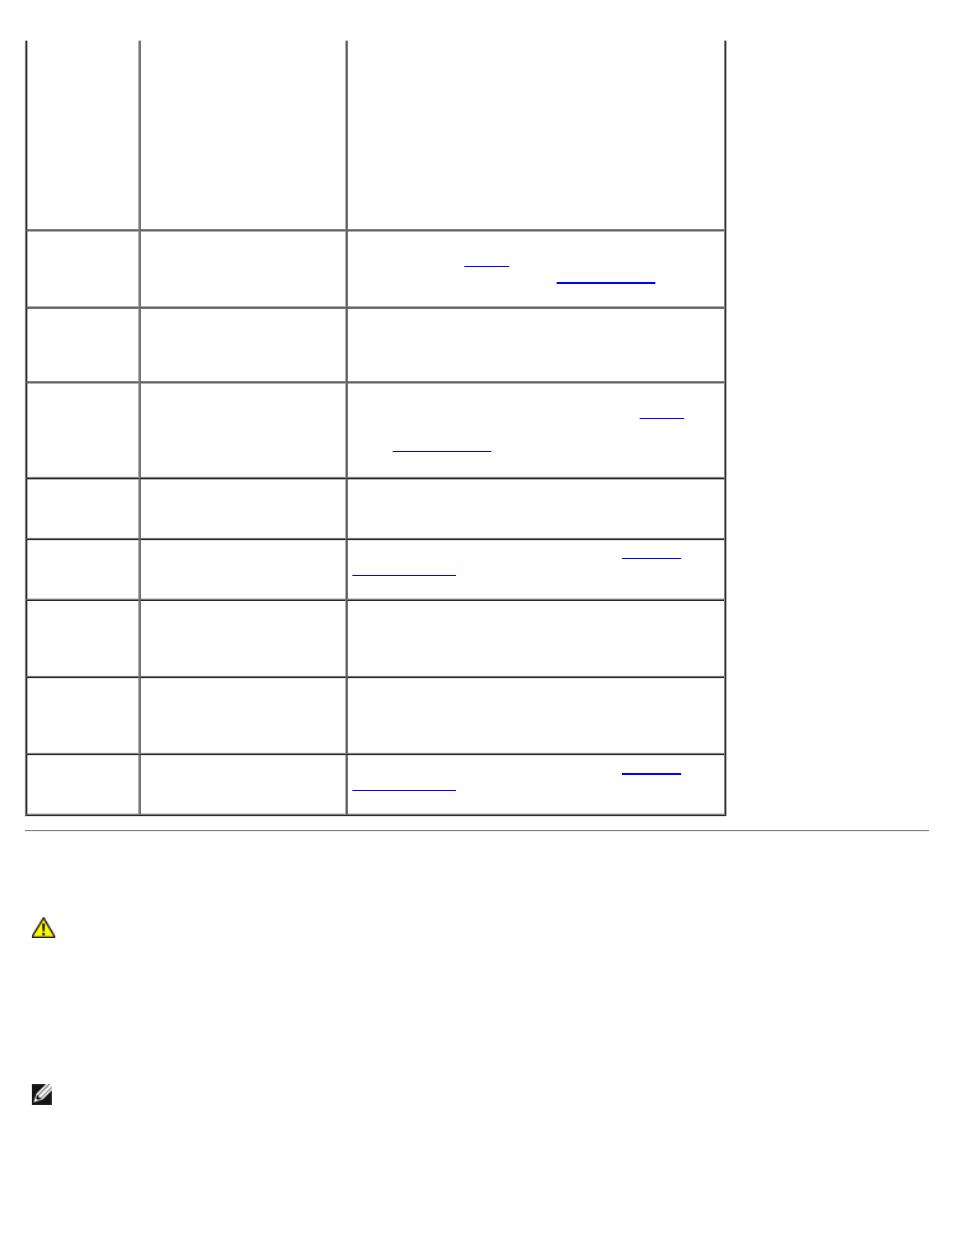 dell diagnostics when to use the dell diagnostics dell xps 710 rh manualsdir com Dell XPS 710 Motherboard Dell XPS 700 Desktop